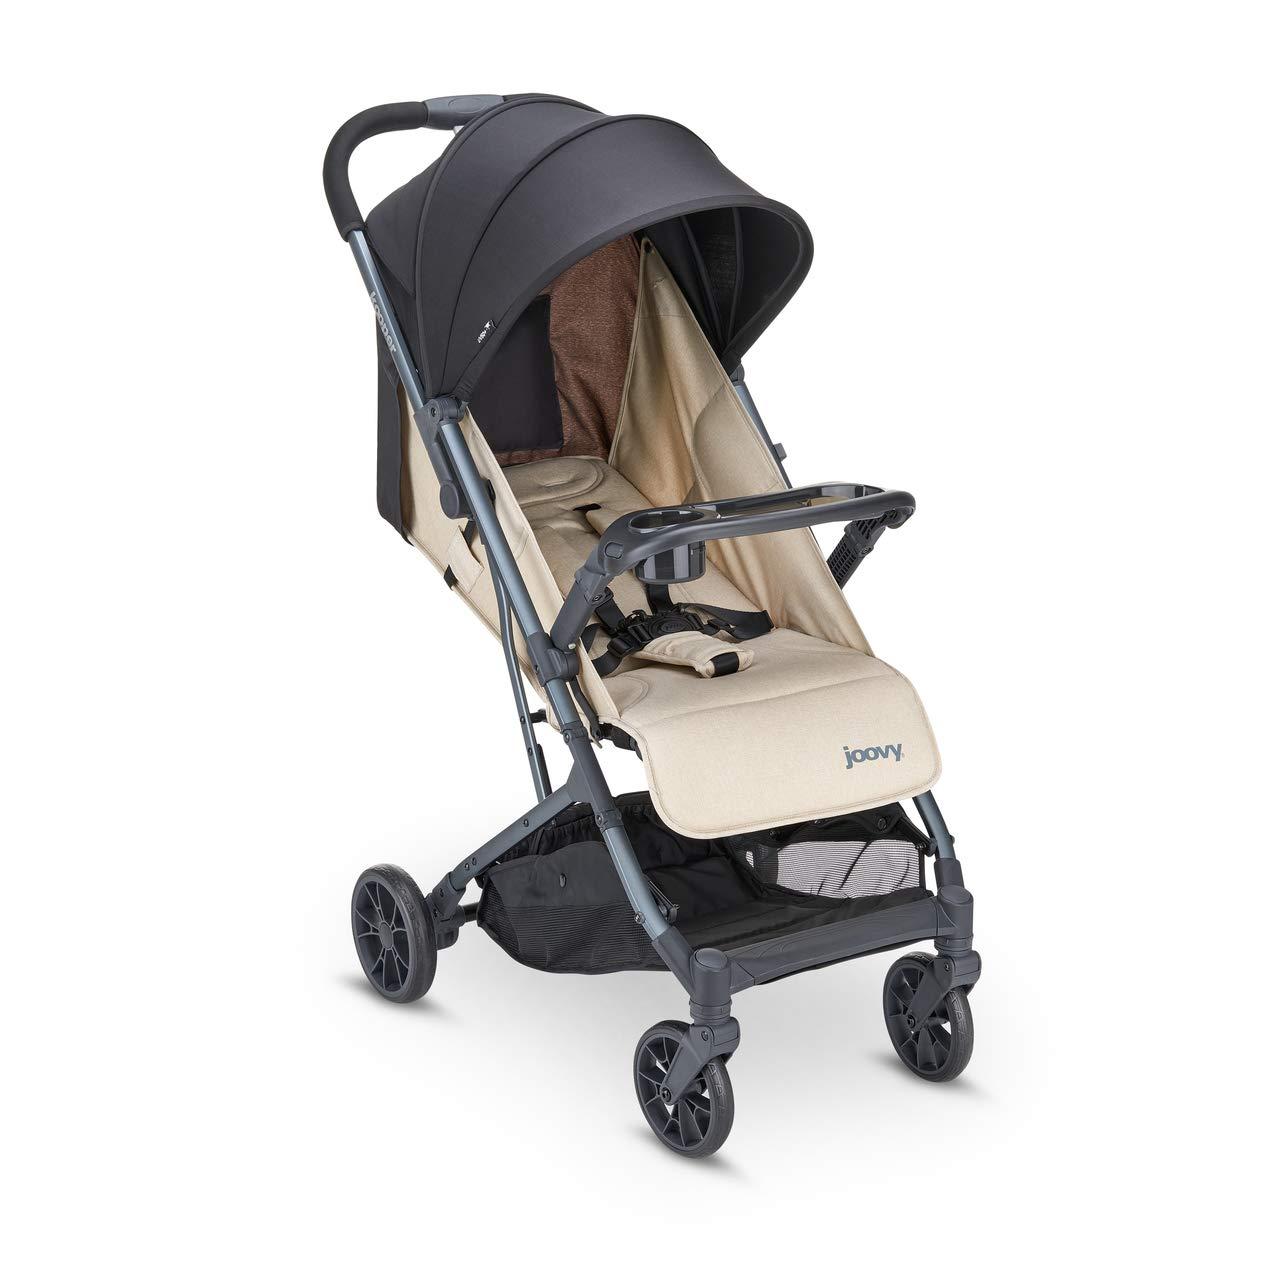 Joovy Kooper Stroller, Lightweight Travel Stroller, Compact Fold with Tray, Sand